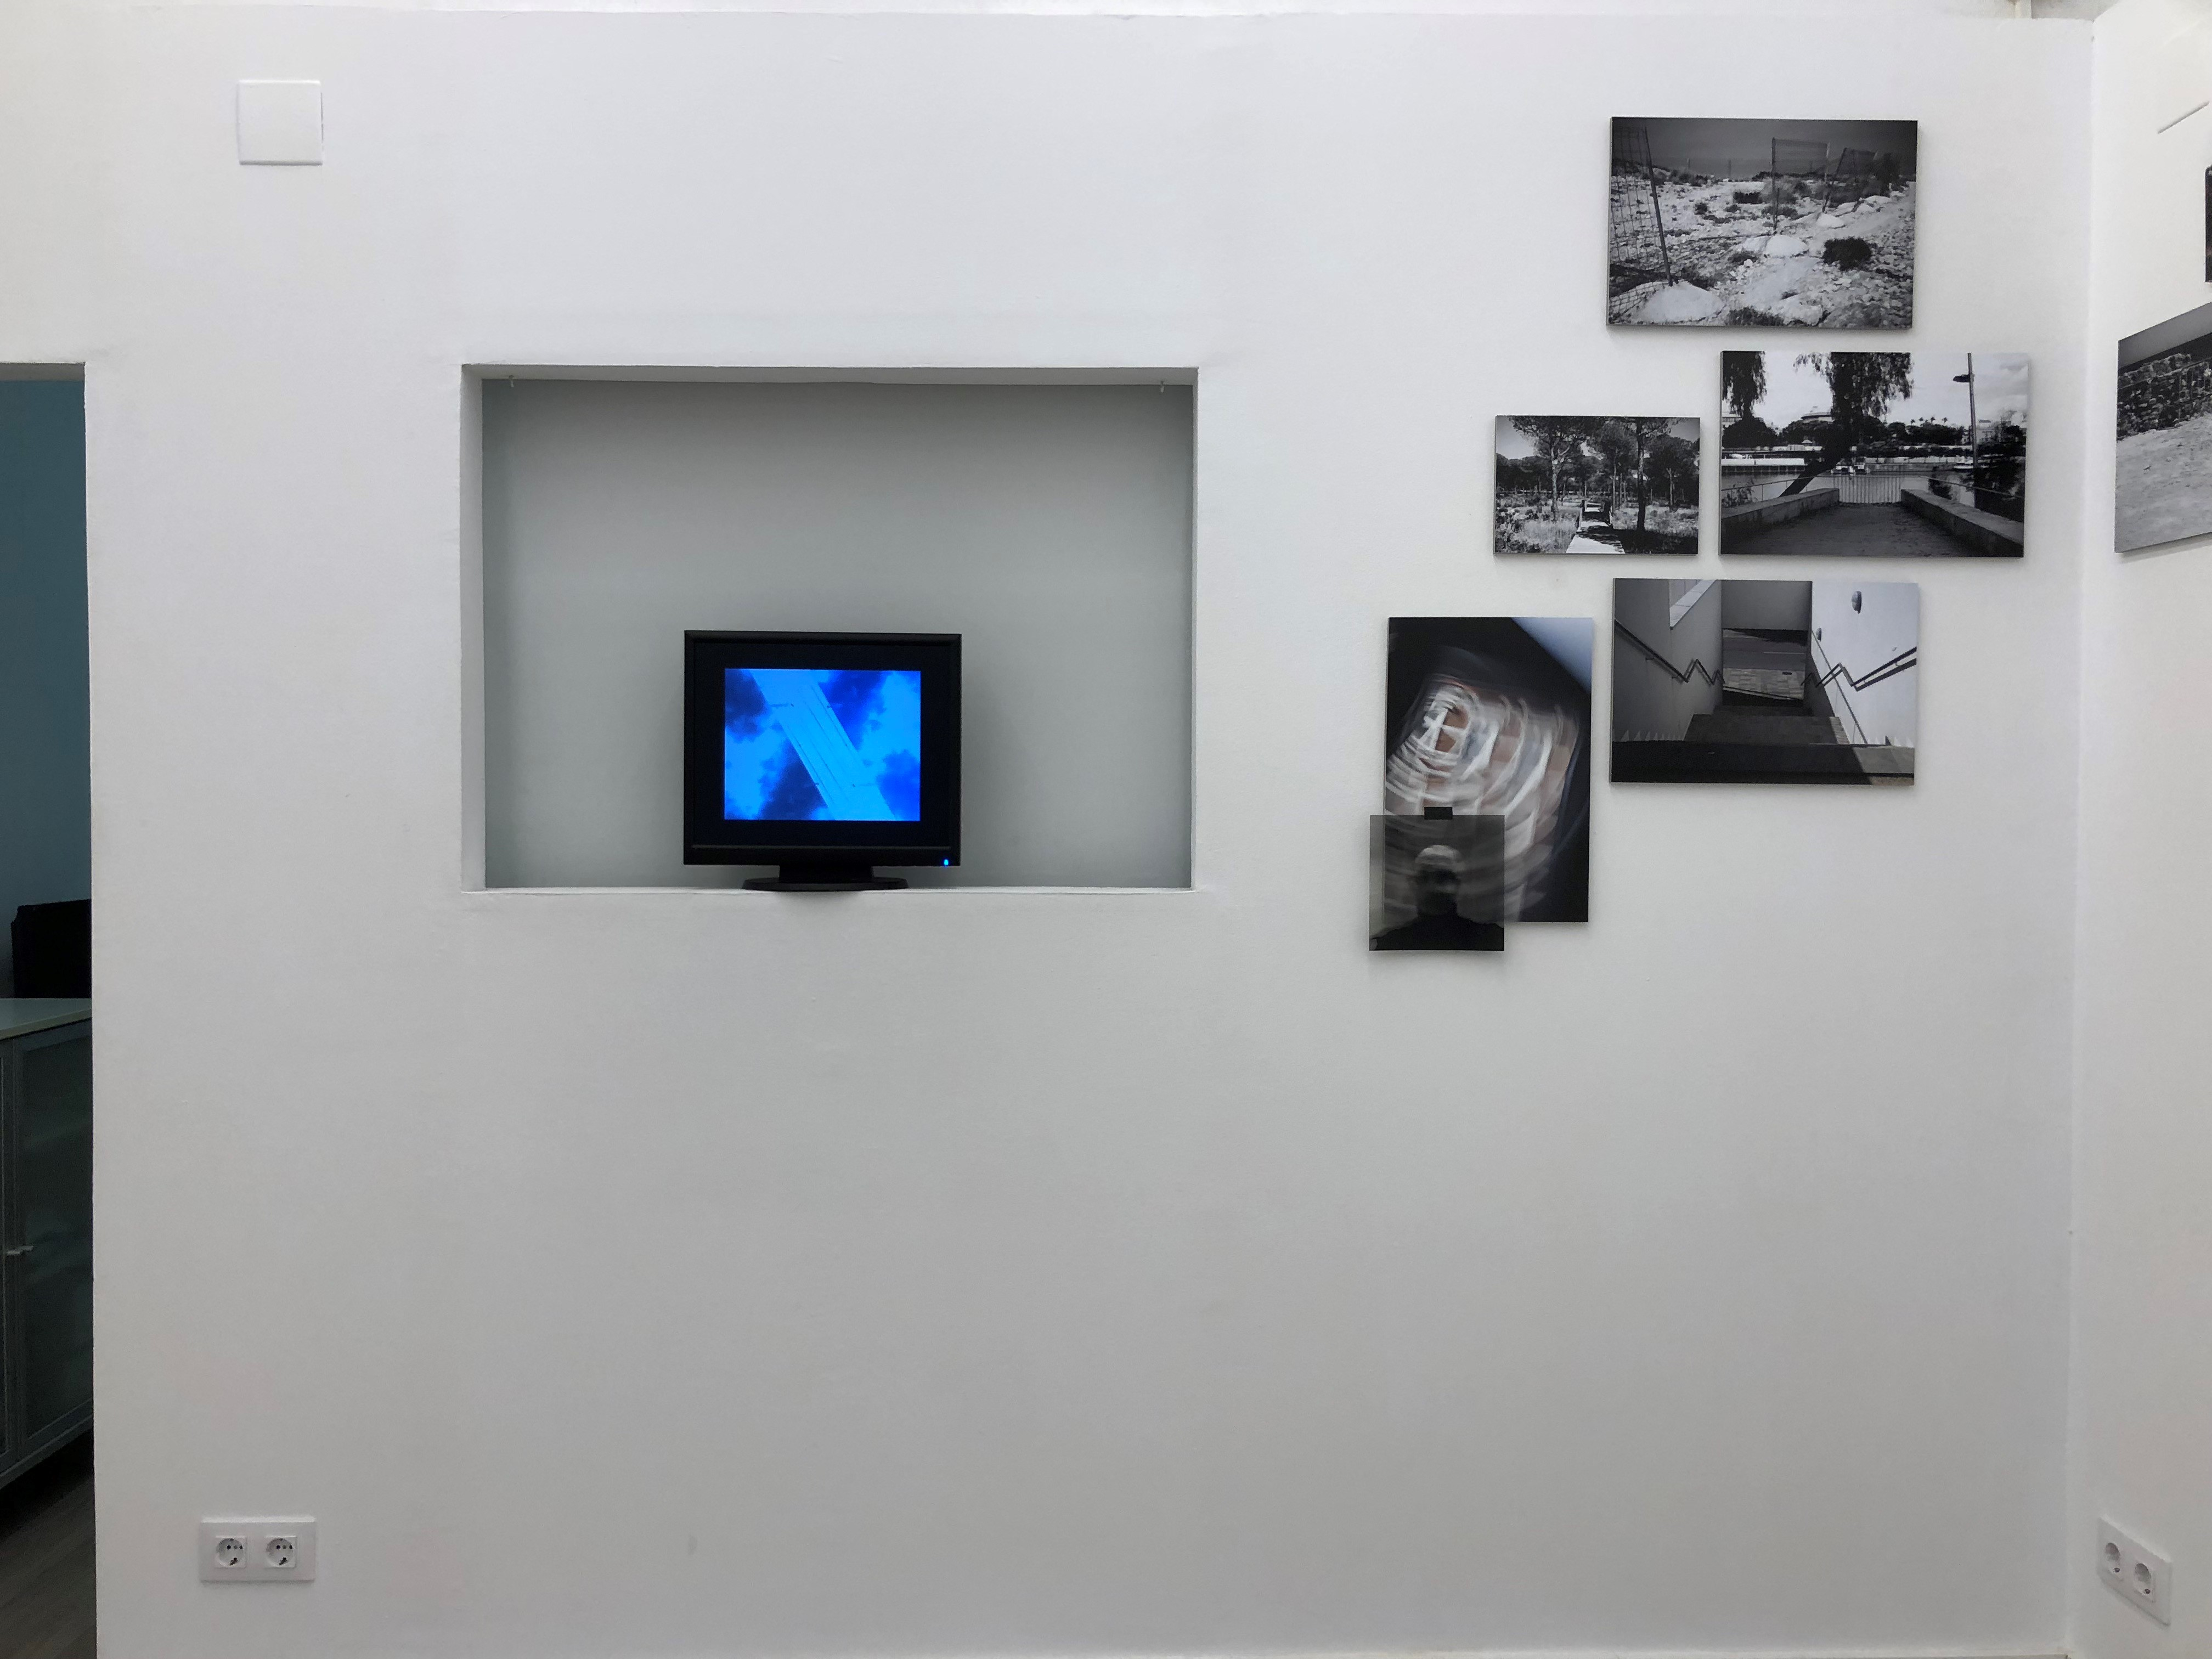 Projekteria_Self_identity_Daffke_Hollstein_Install_with_video